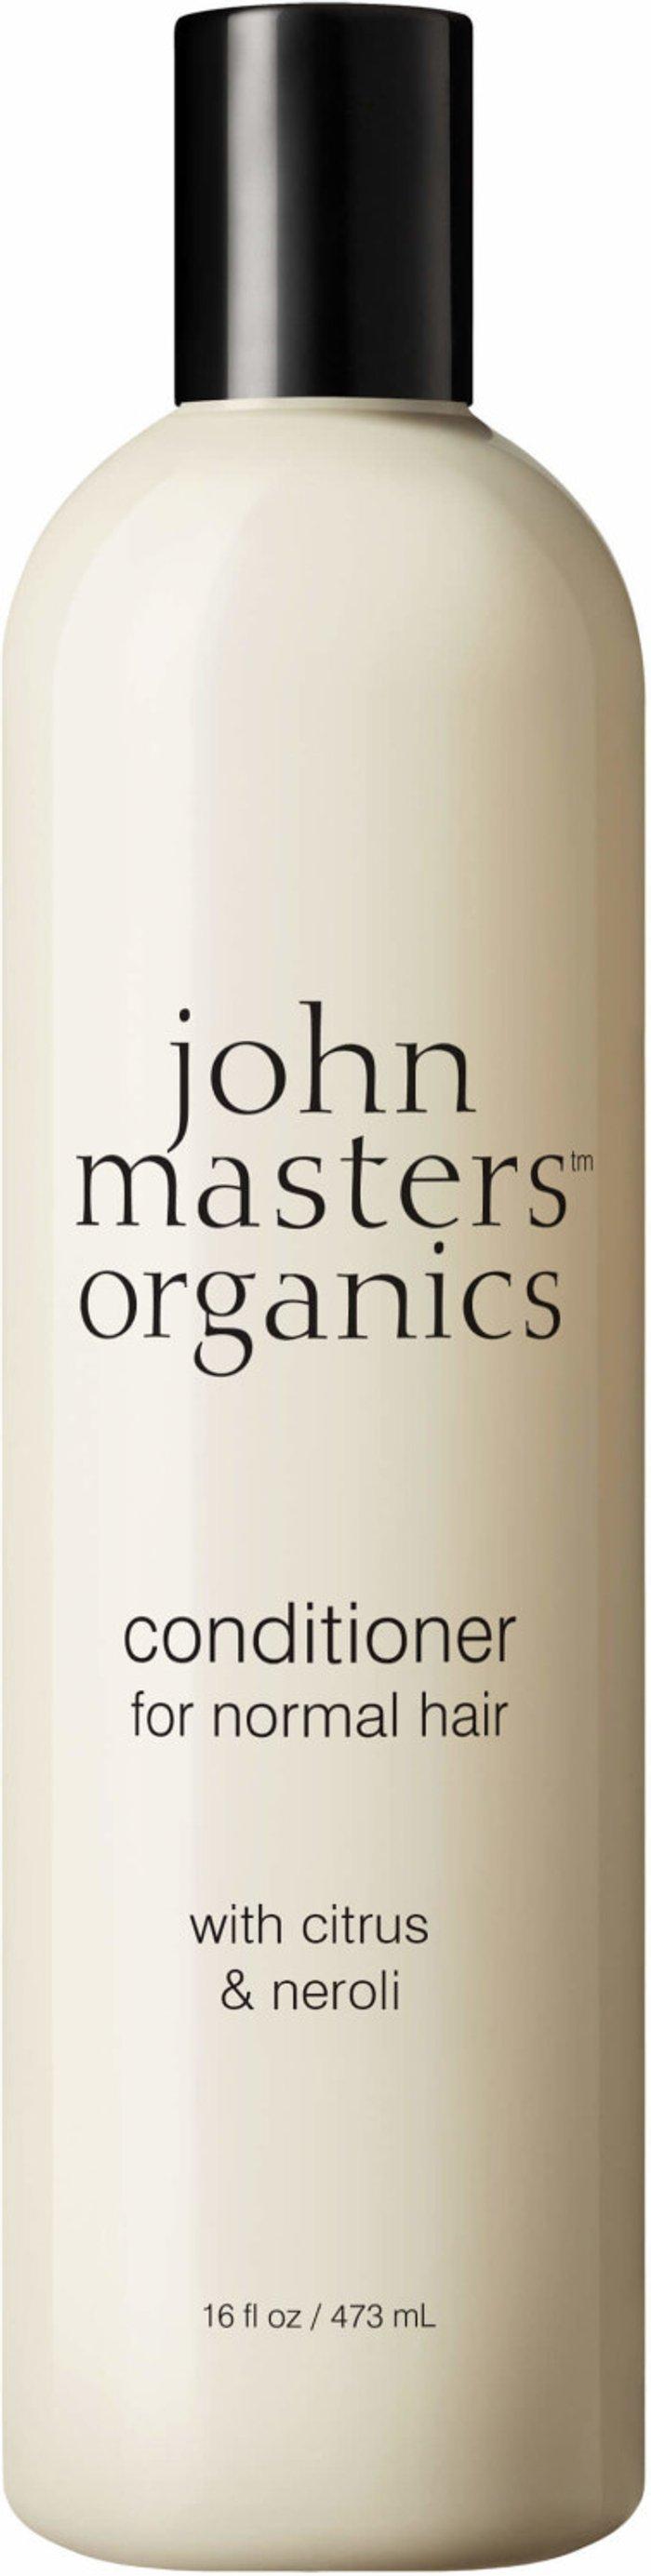 John Masters Organics John Masters Organics Citrus & Neroli Conditioner (473ml)